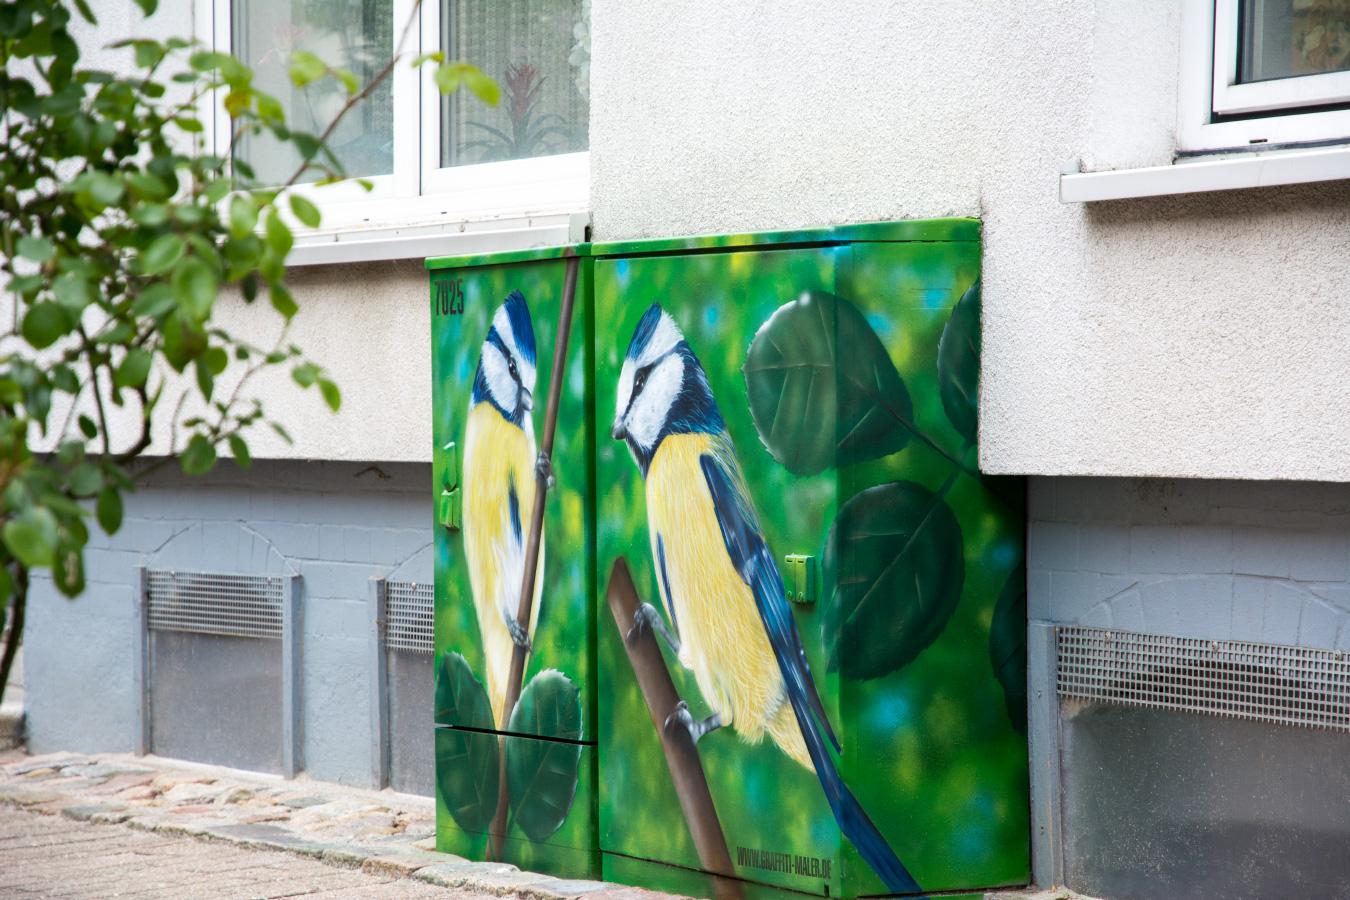 stromkasten_graffiti_maler_meisen_voegel_flensburg_stromfarben_02